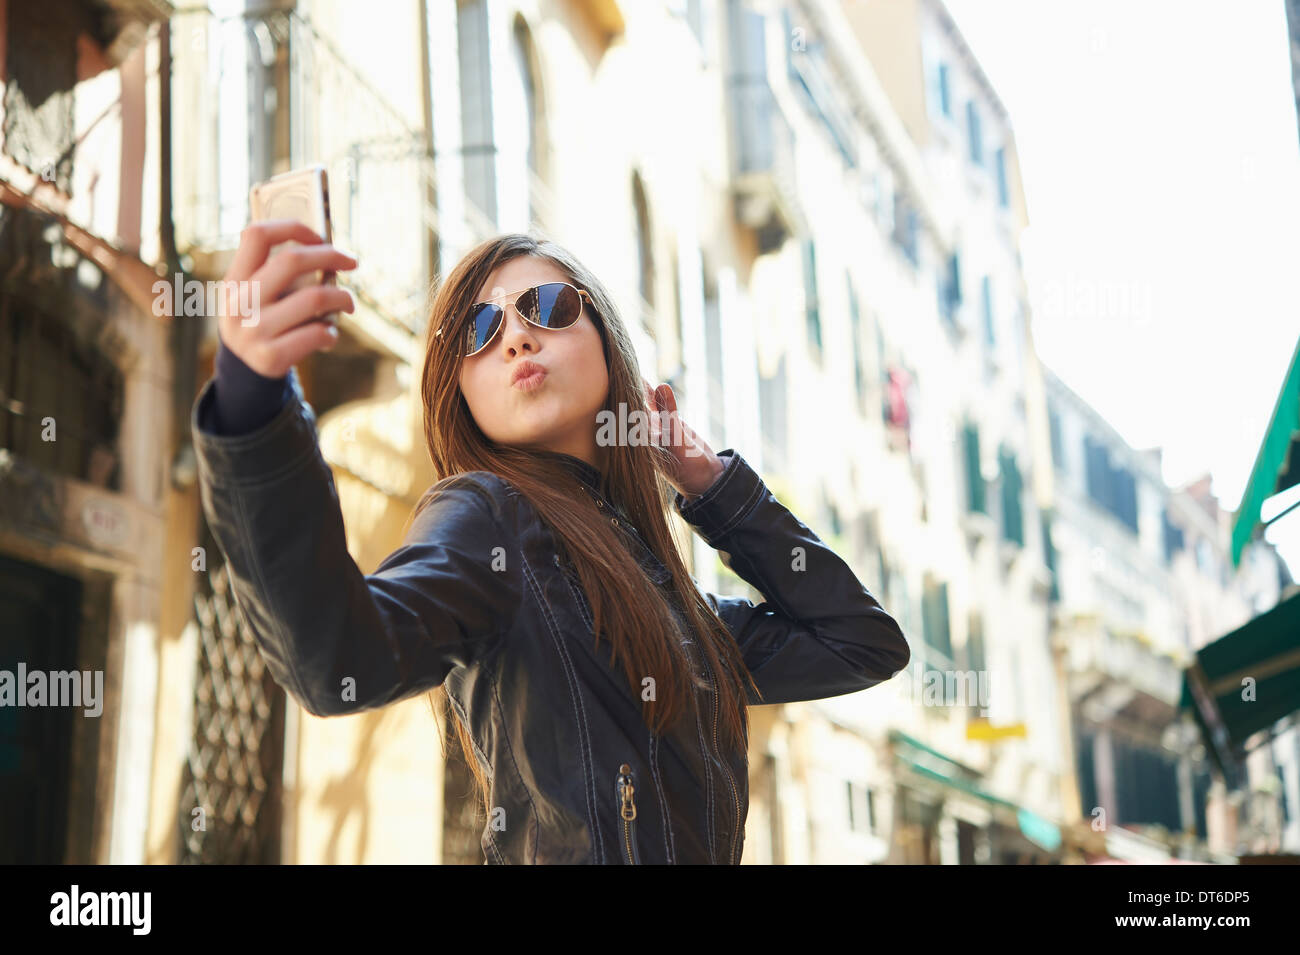 Girl taking selfie on smartphone, Venice, Italy - Stock Image